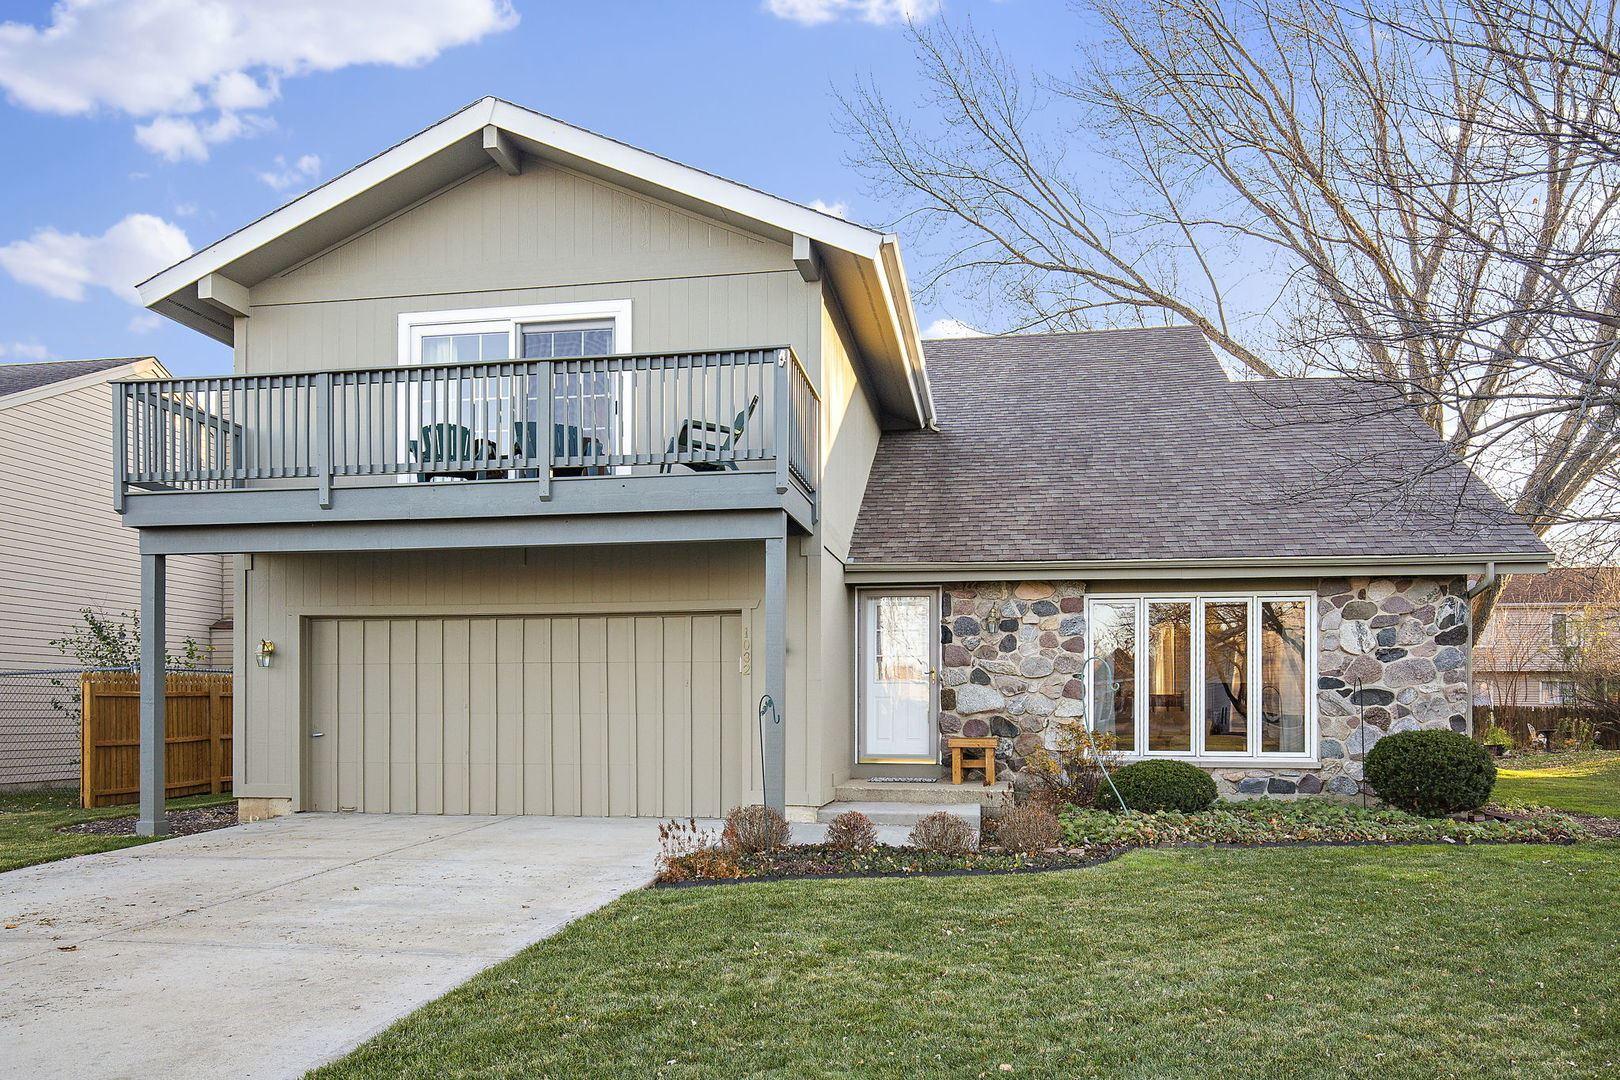 1032 Hawthorne Drive, Crystal Lake, IL 60014 - #: 10927141